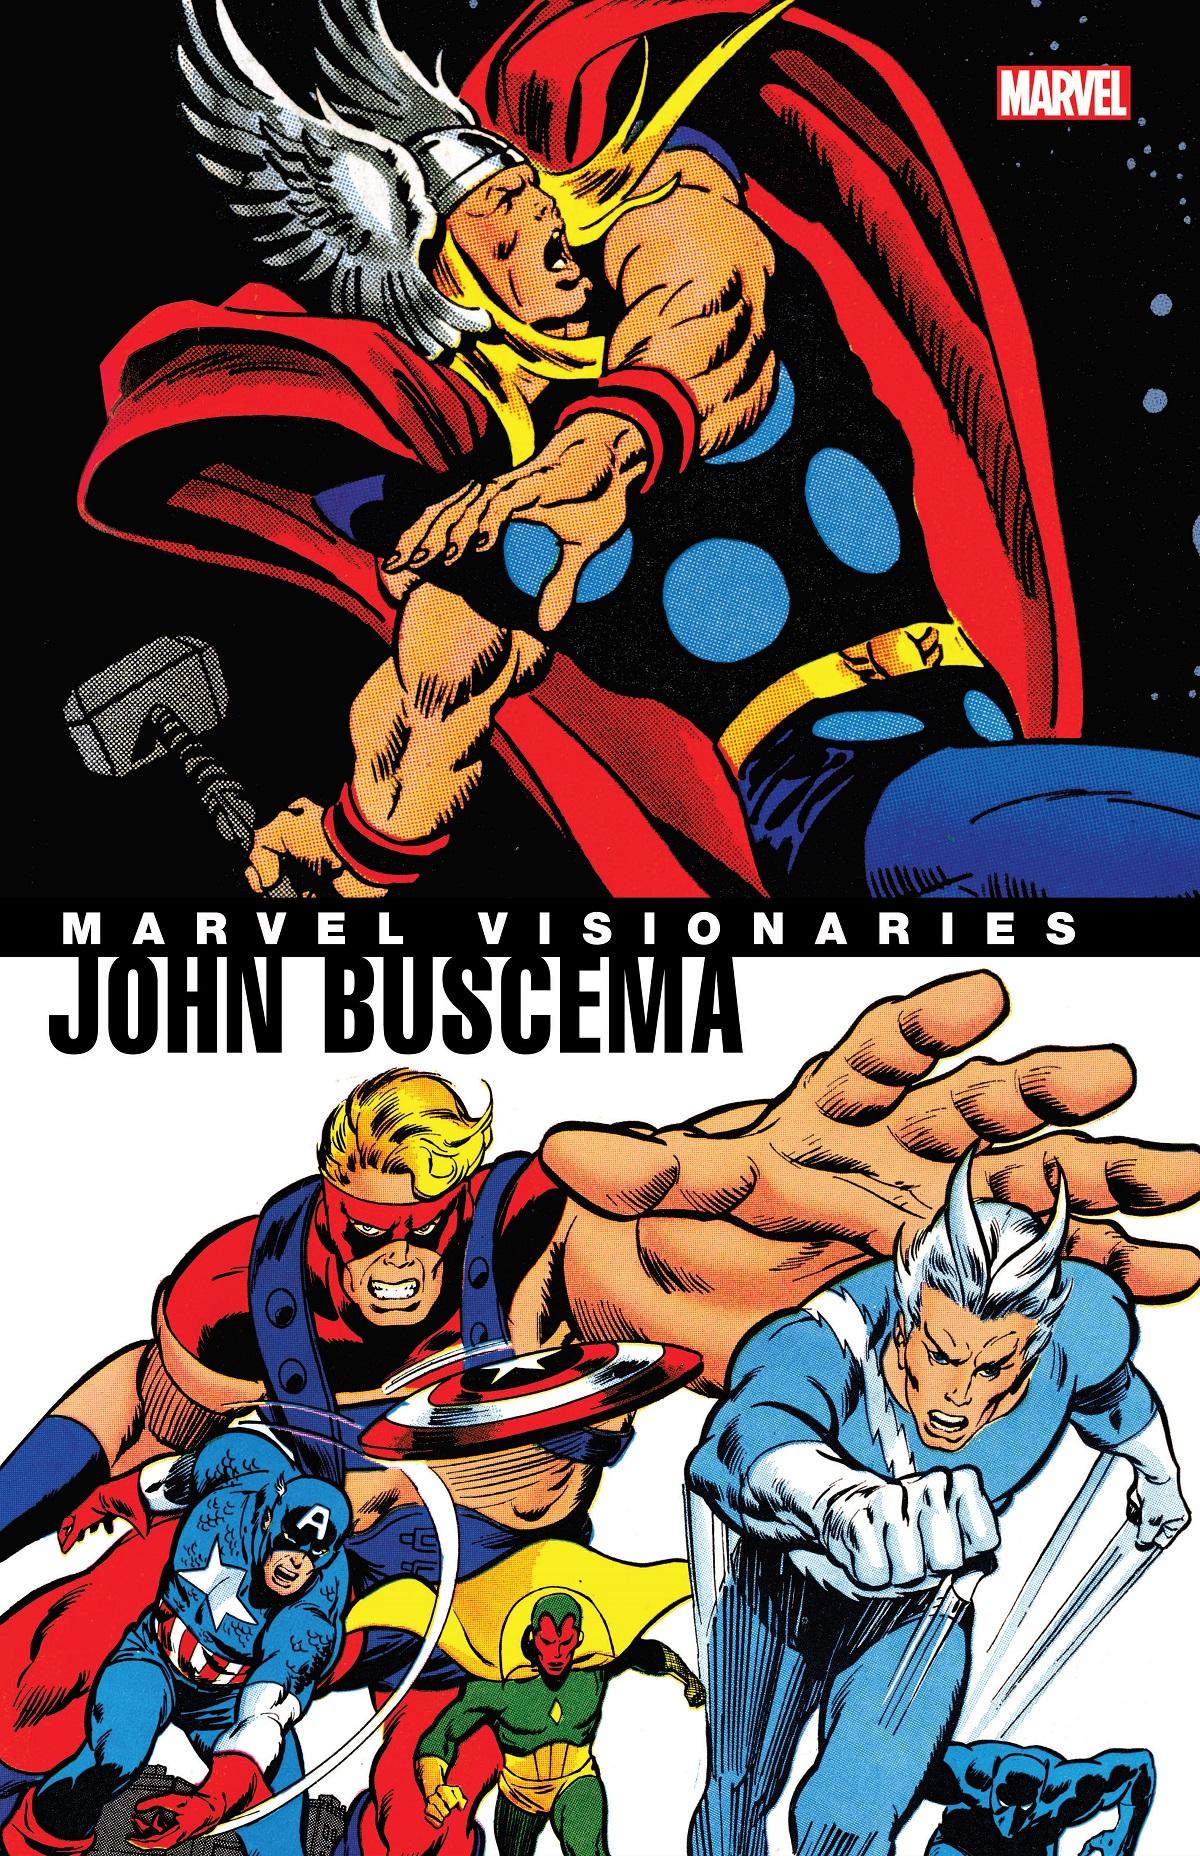 Marvel Visionaries: John Buscema (Trade Paperback)